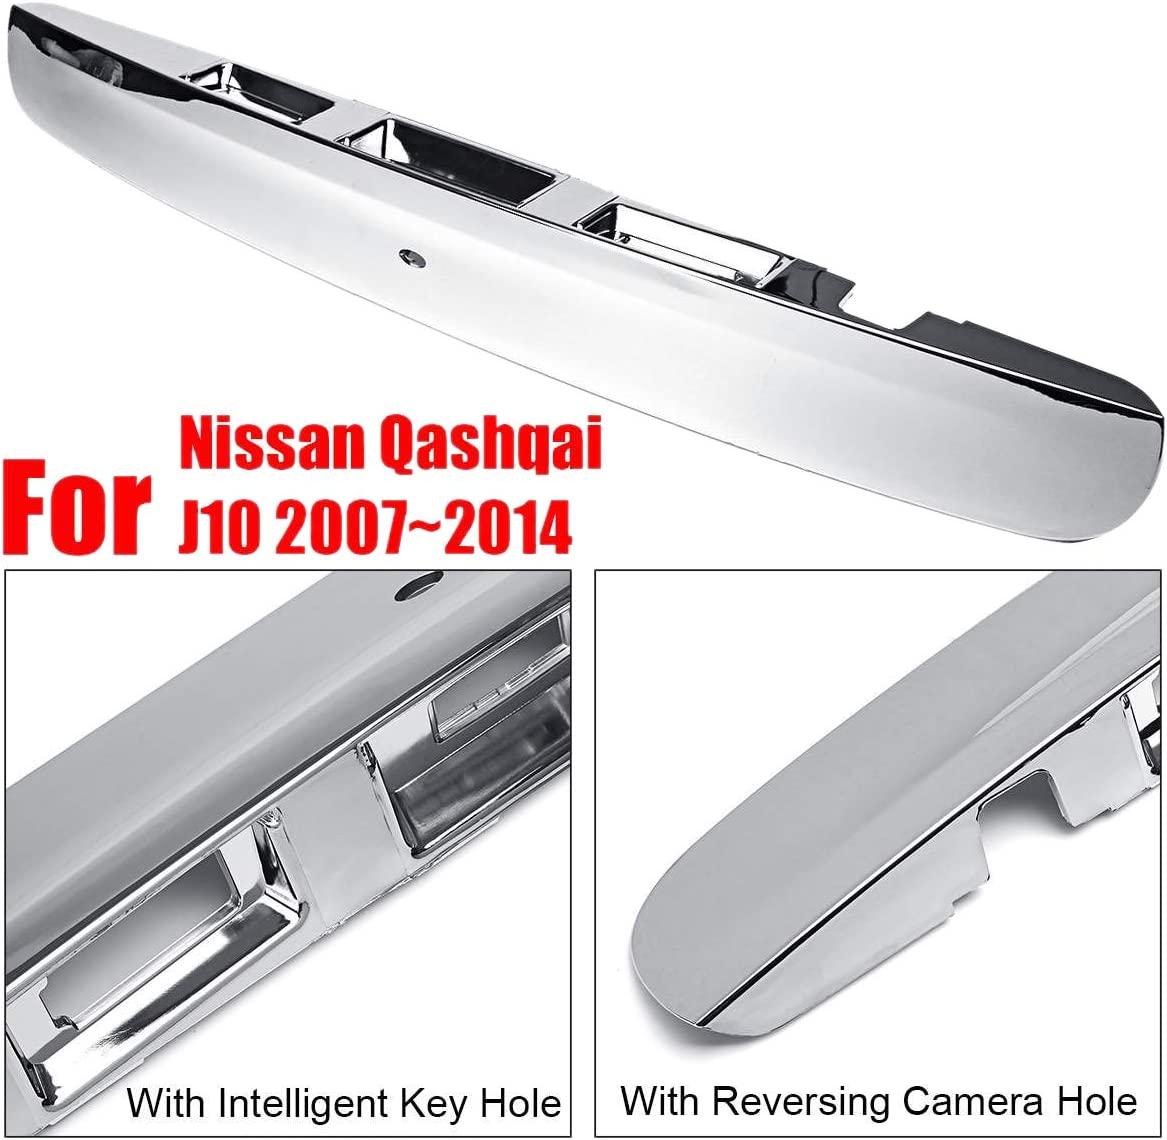 Domilay/Chrom Heckklappen Kofferraum Deckel Griff f/ür Nissan Qashqai J10 2007-2014 mit I-Key /& Kamera Loch